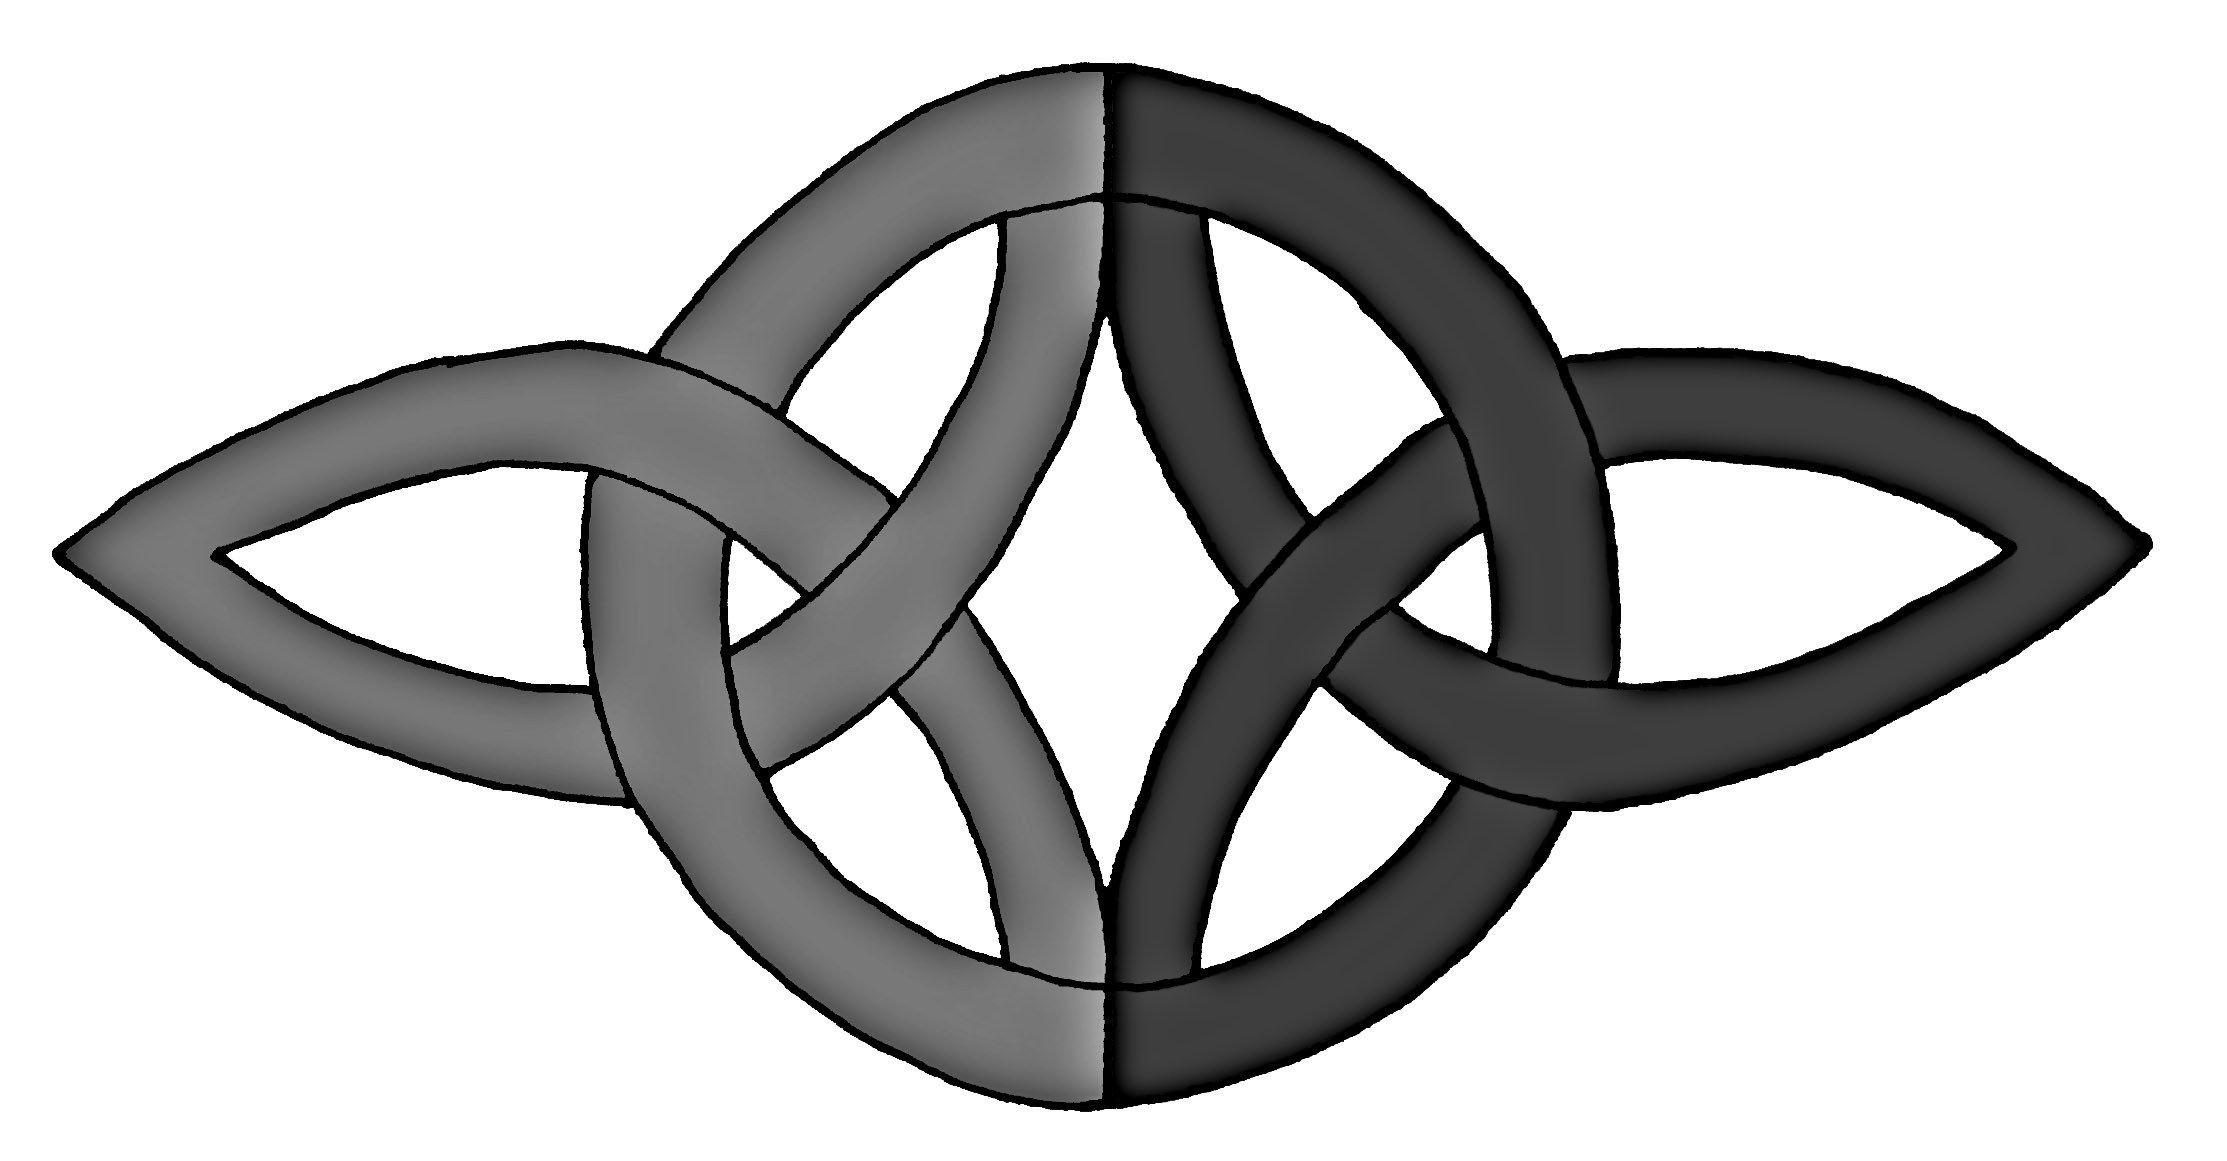 Celtic symbol everlasting love gallery symbol and sign ideas celtic symbols irish celtic tattoo symbols nice irish celtic celtic symbols irish celtic tattoo symbols nice biocorpaavc